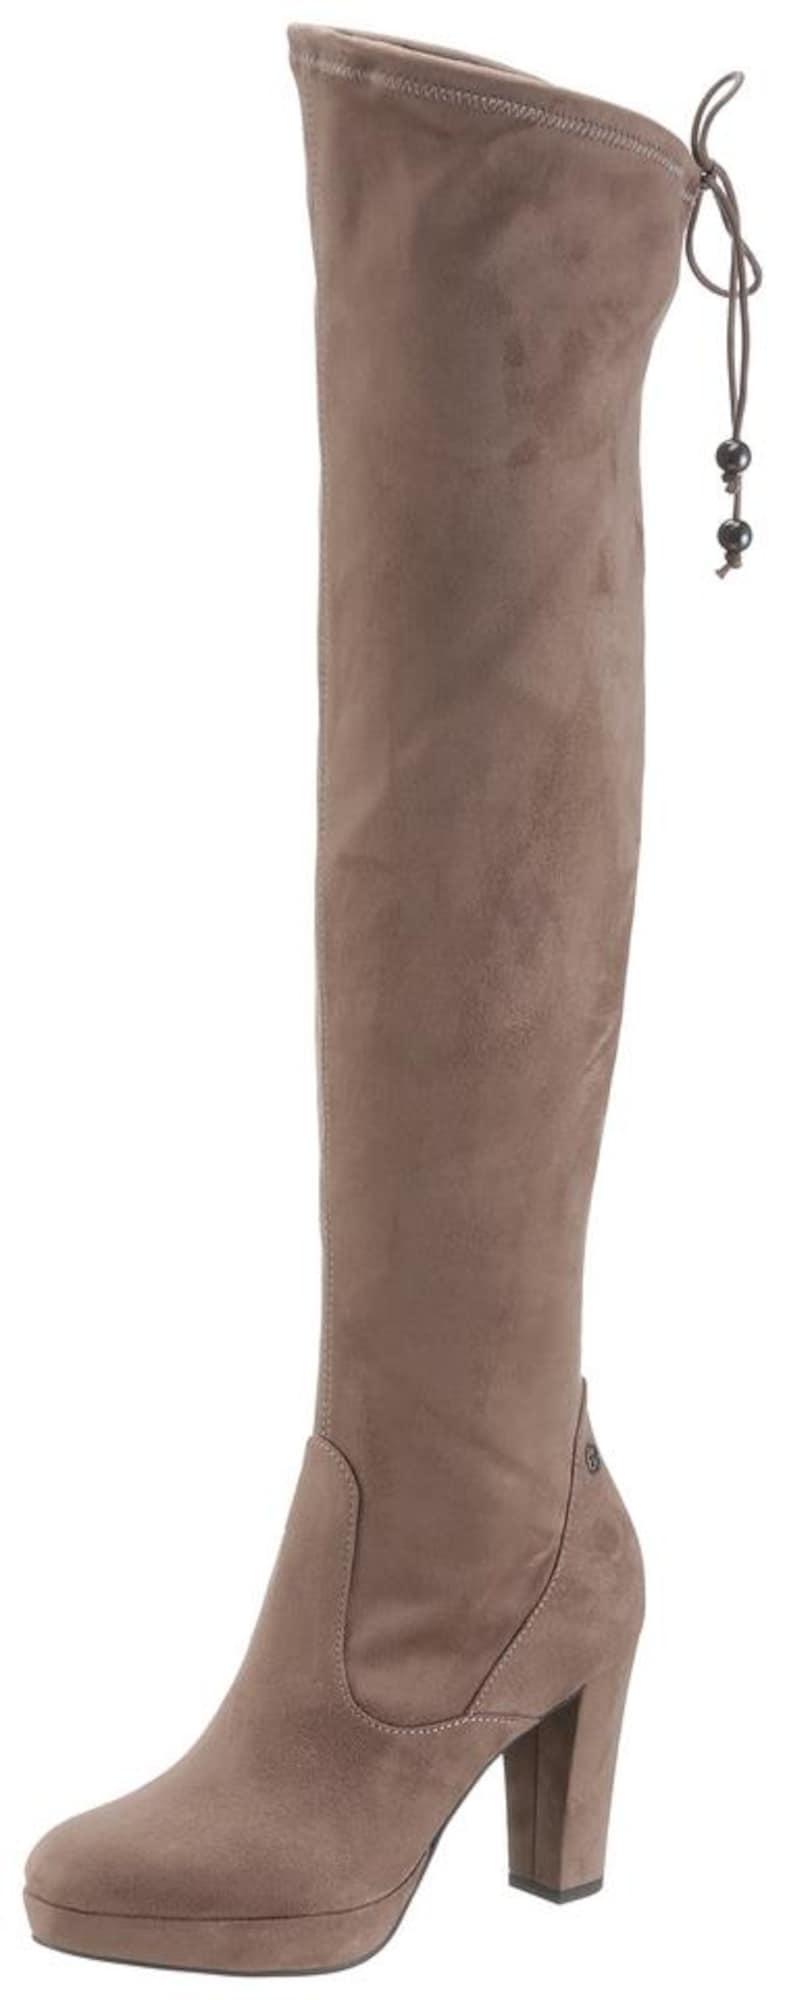 Kozačky nad kolena béžová TAMARIS